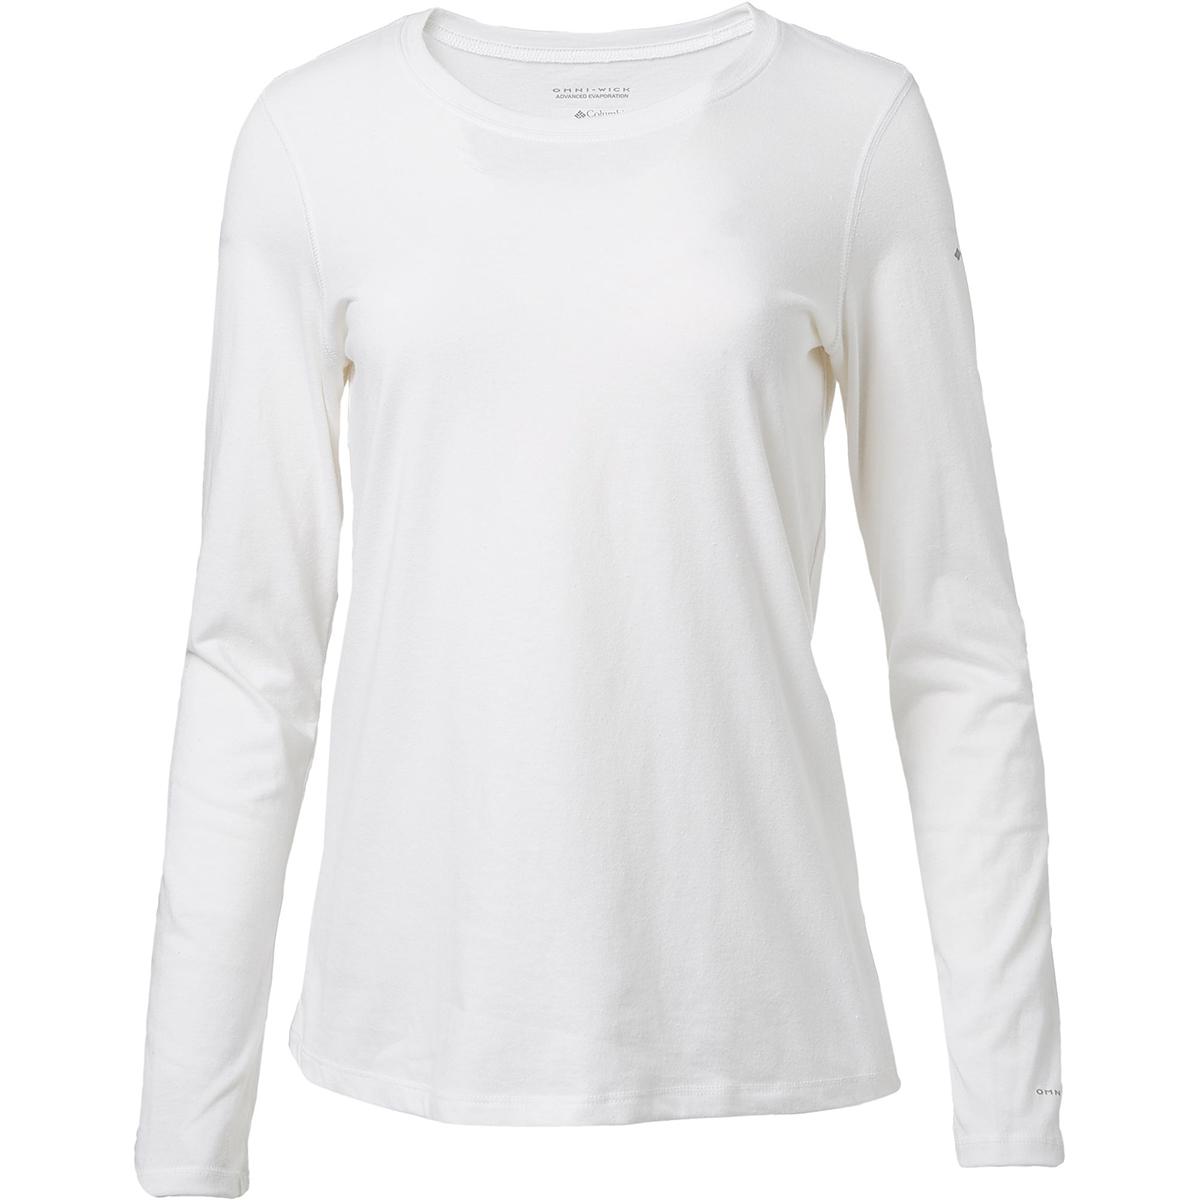 Columbia Women's Solar Shield Long-Sleeve Shirt - White, S